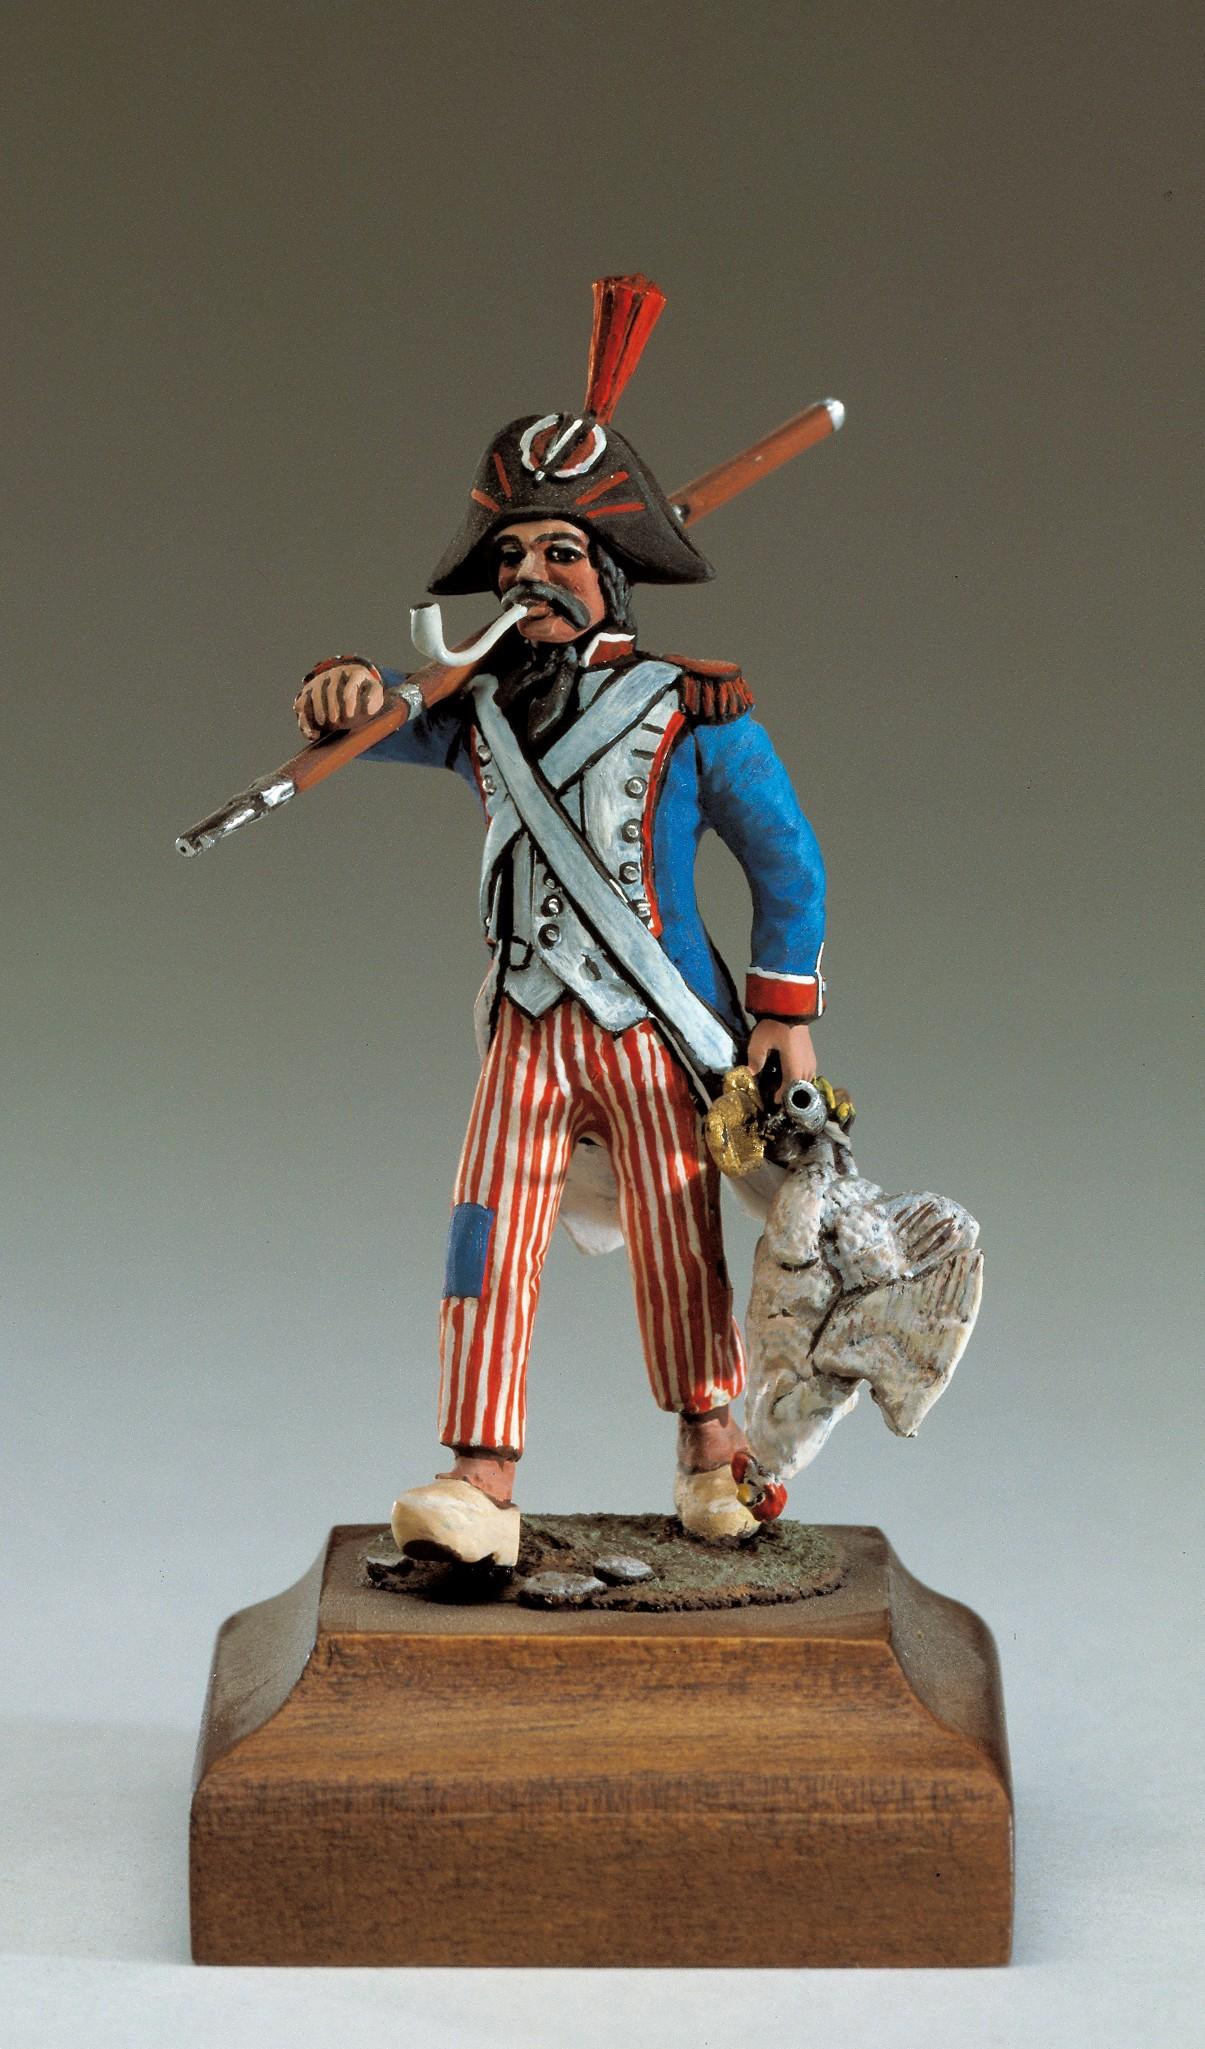 French Grenadier Figurine, 1752 (Amati)